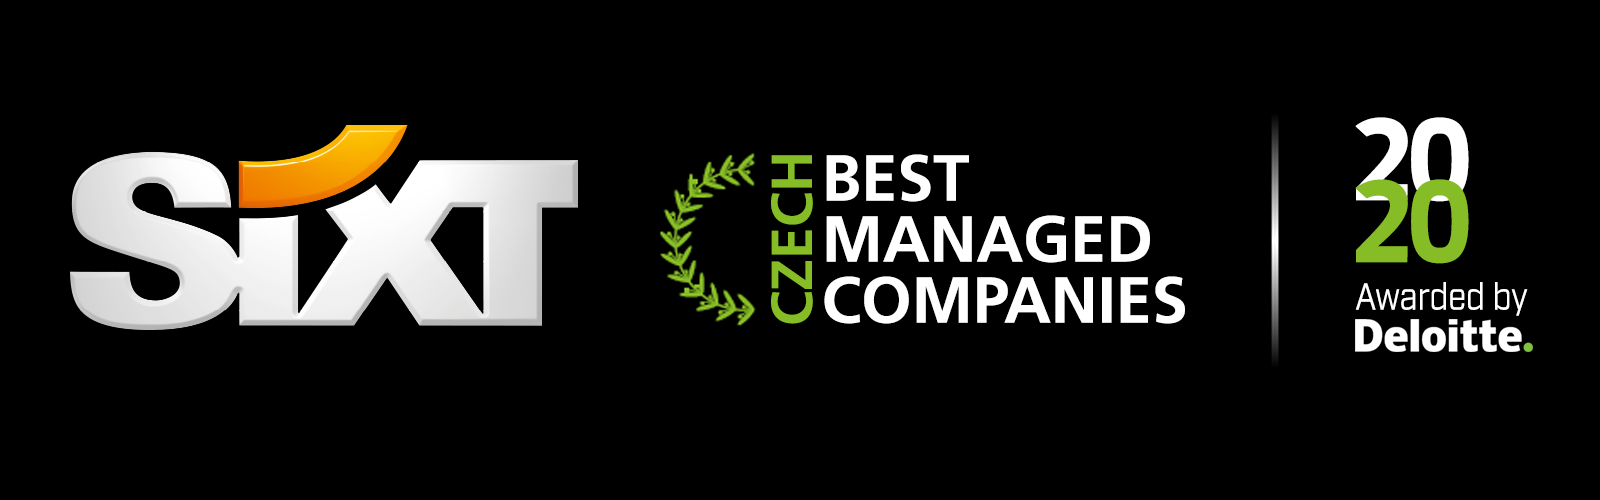 best manager companies SIXT_1600x500_deloitte